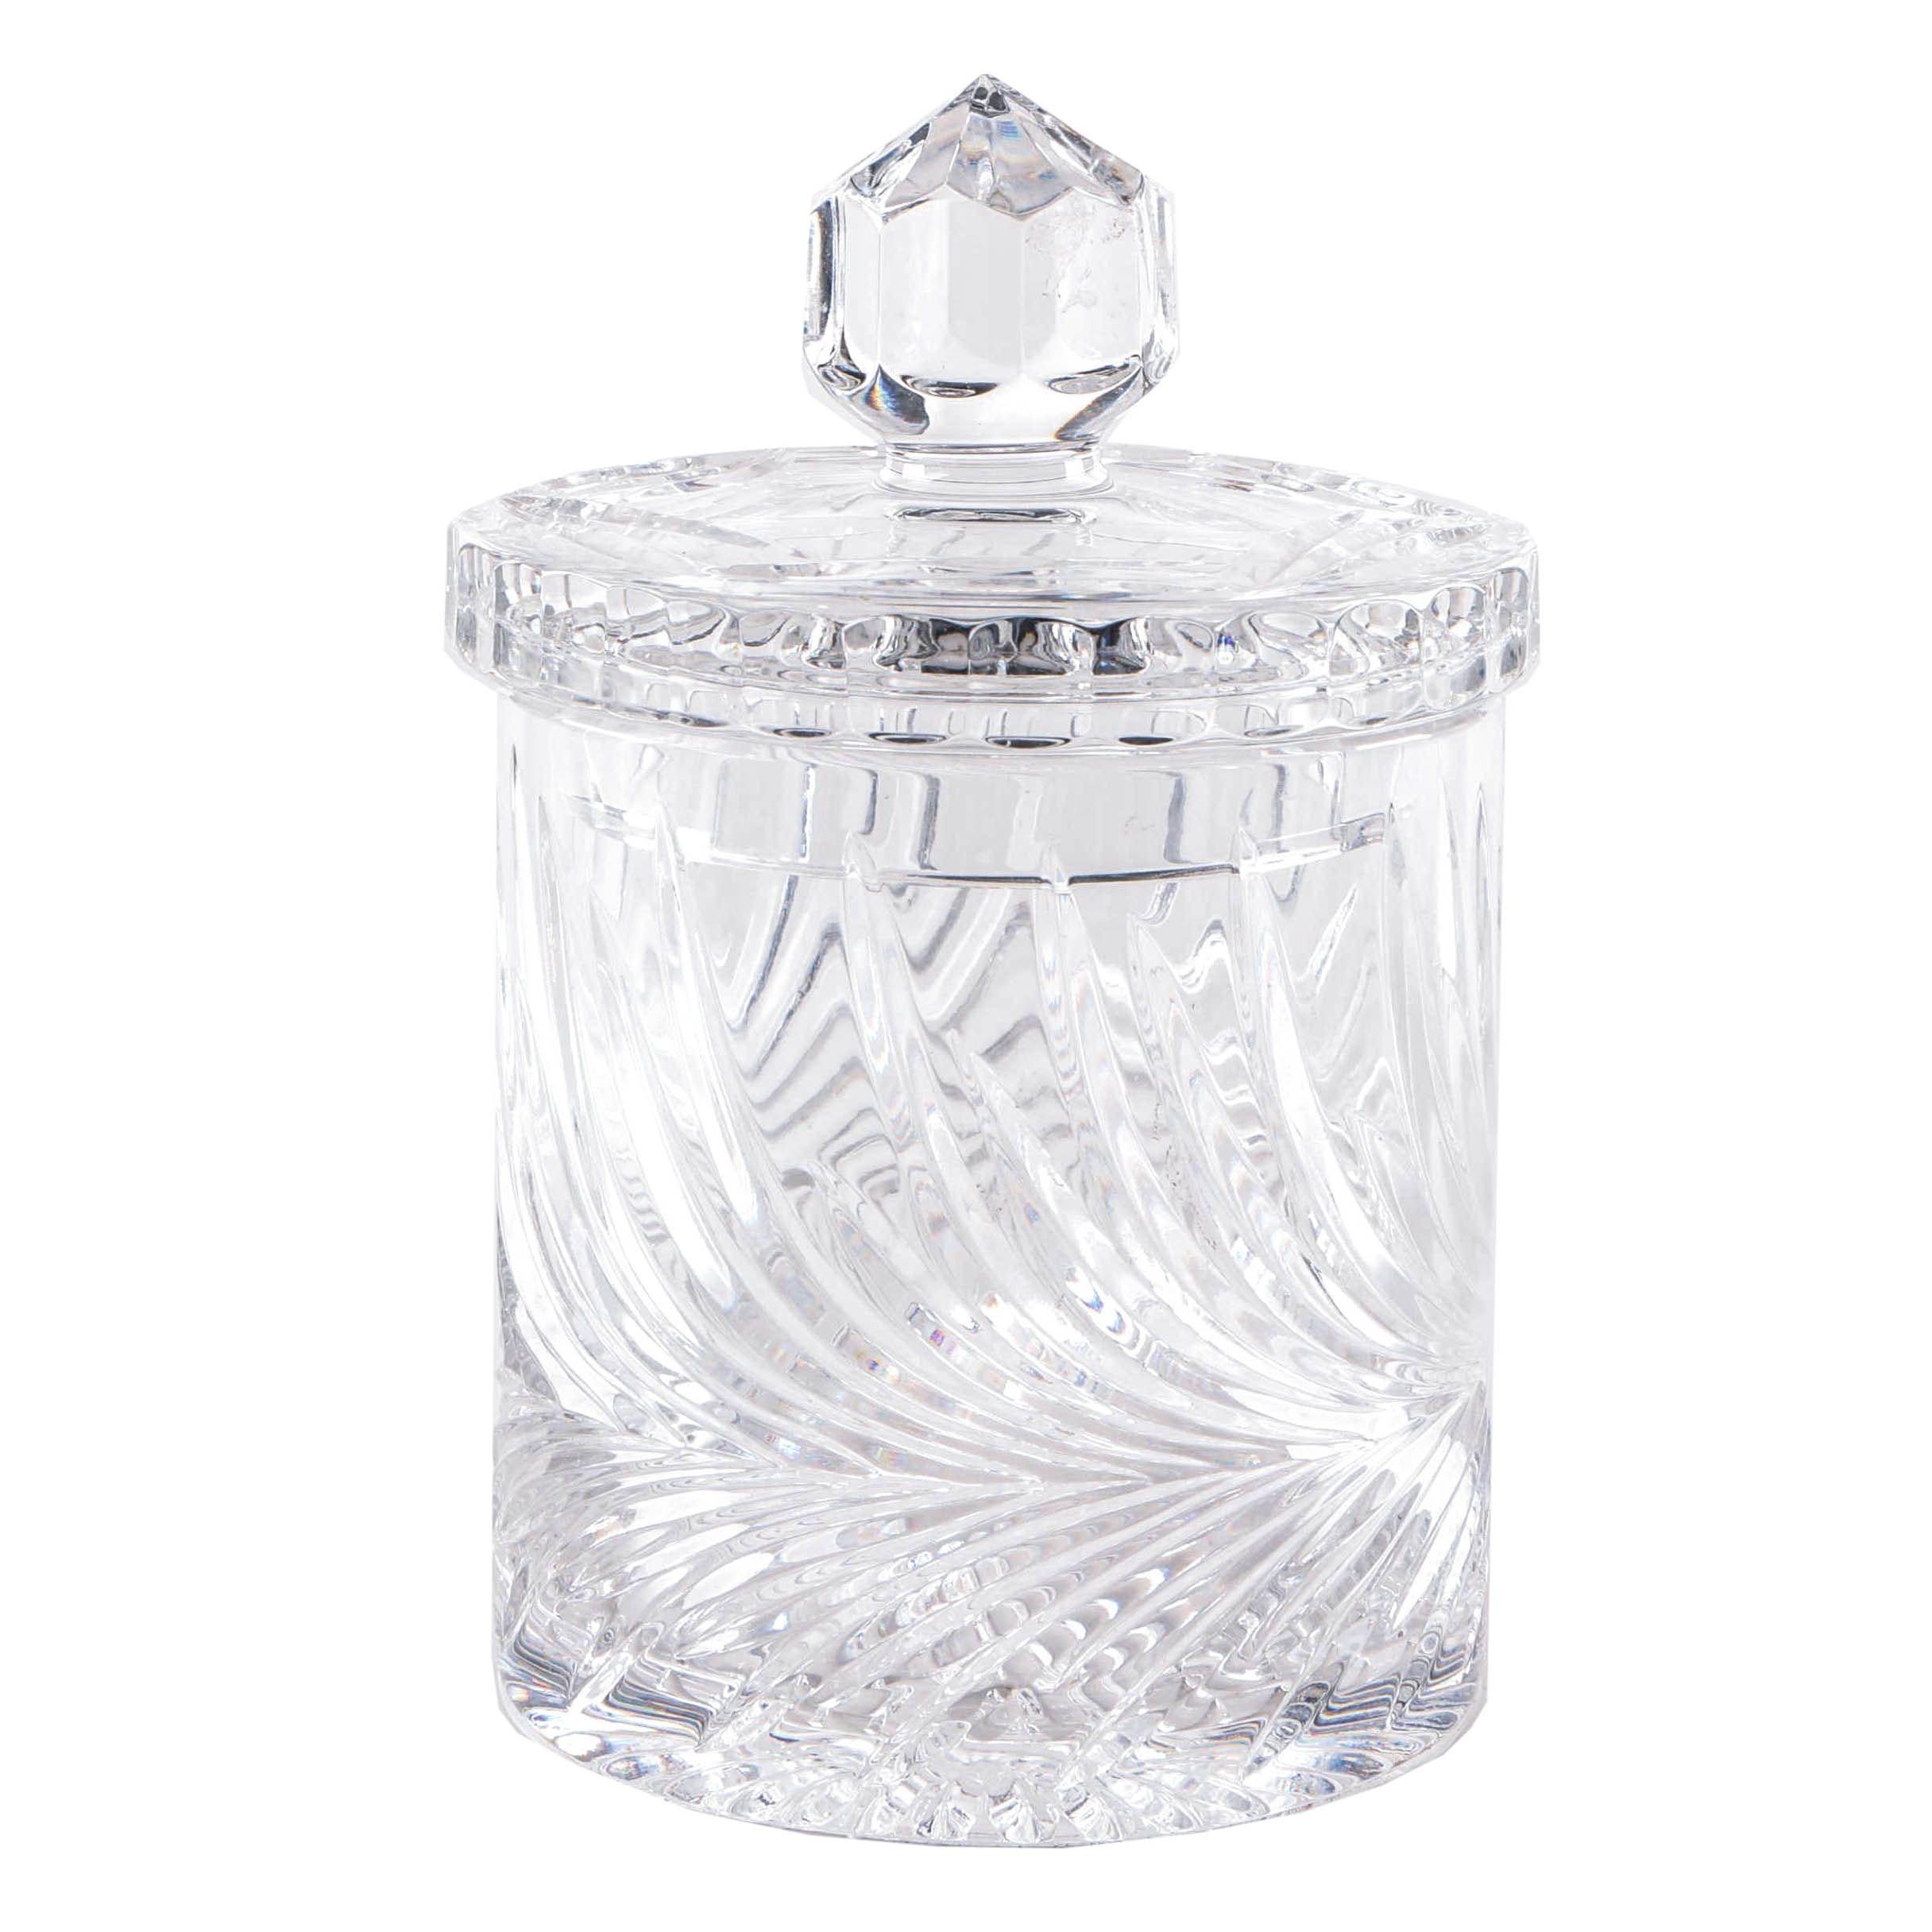 Pressed Foliate Motif Crystal Jar